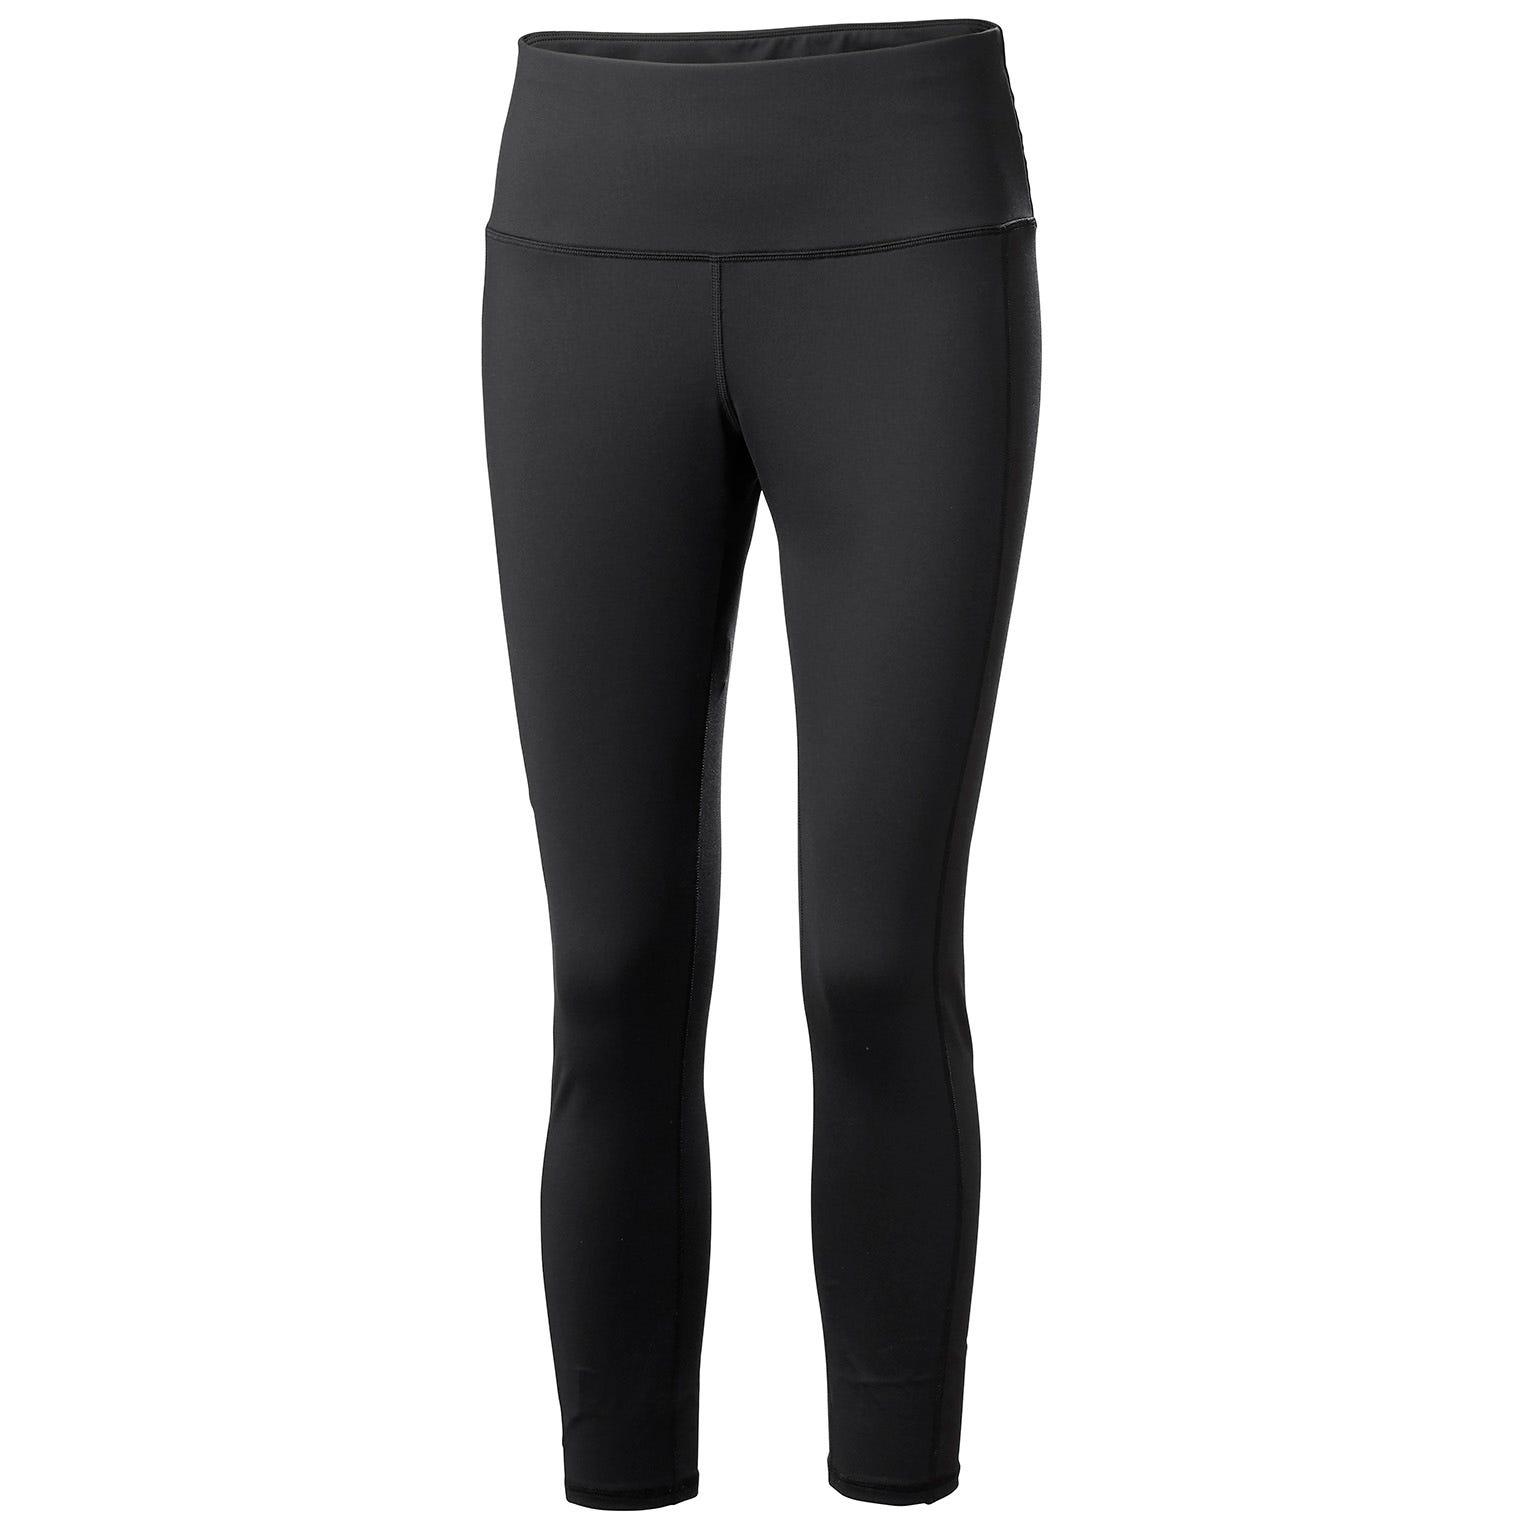 Helly Hansen Womens Verglas 7/8 Tights Hiking Trouser Black M